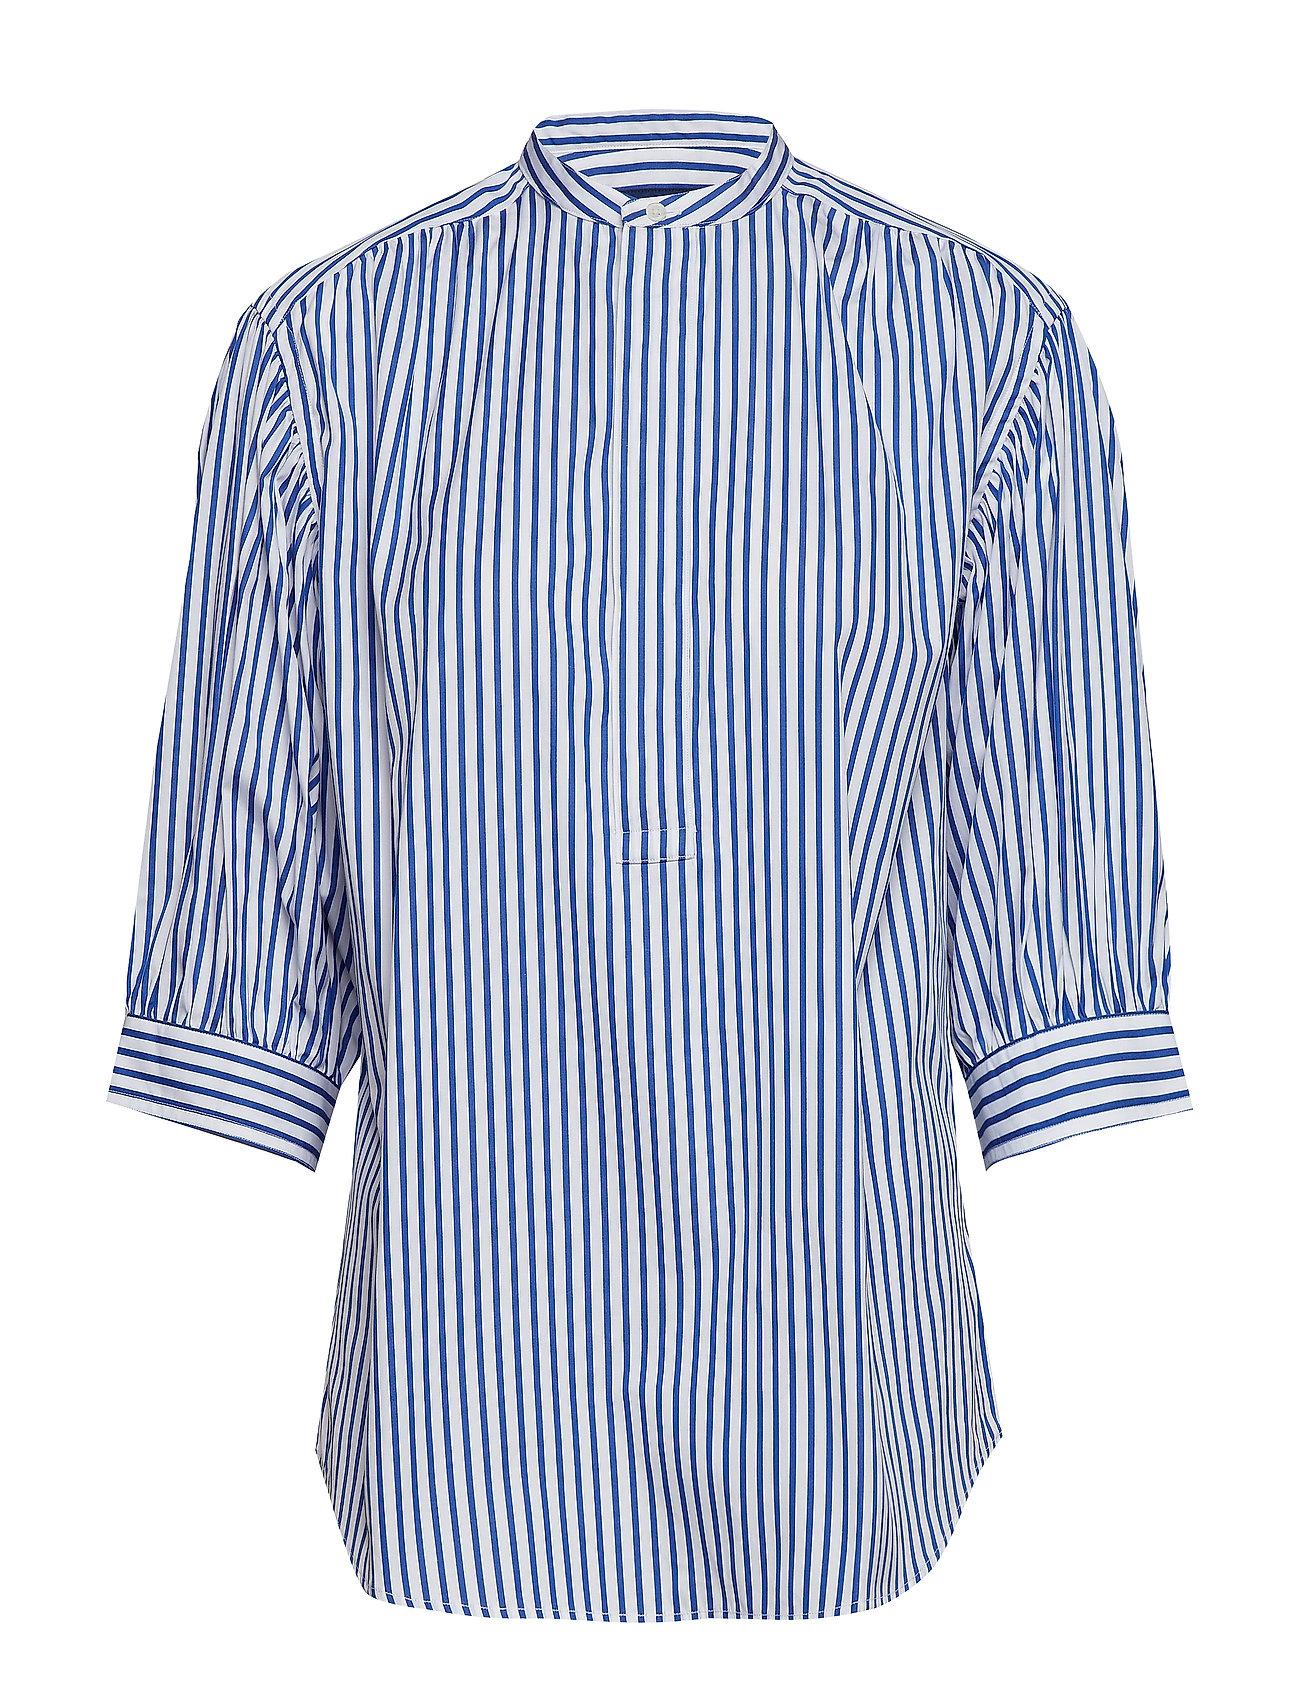 Polo Ralph Lauren Striped Cotton Shirt - 814 BLUE/WHITE